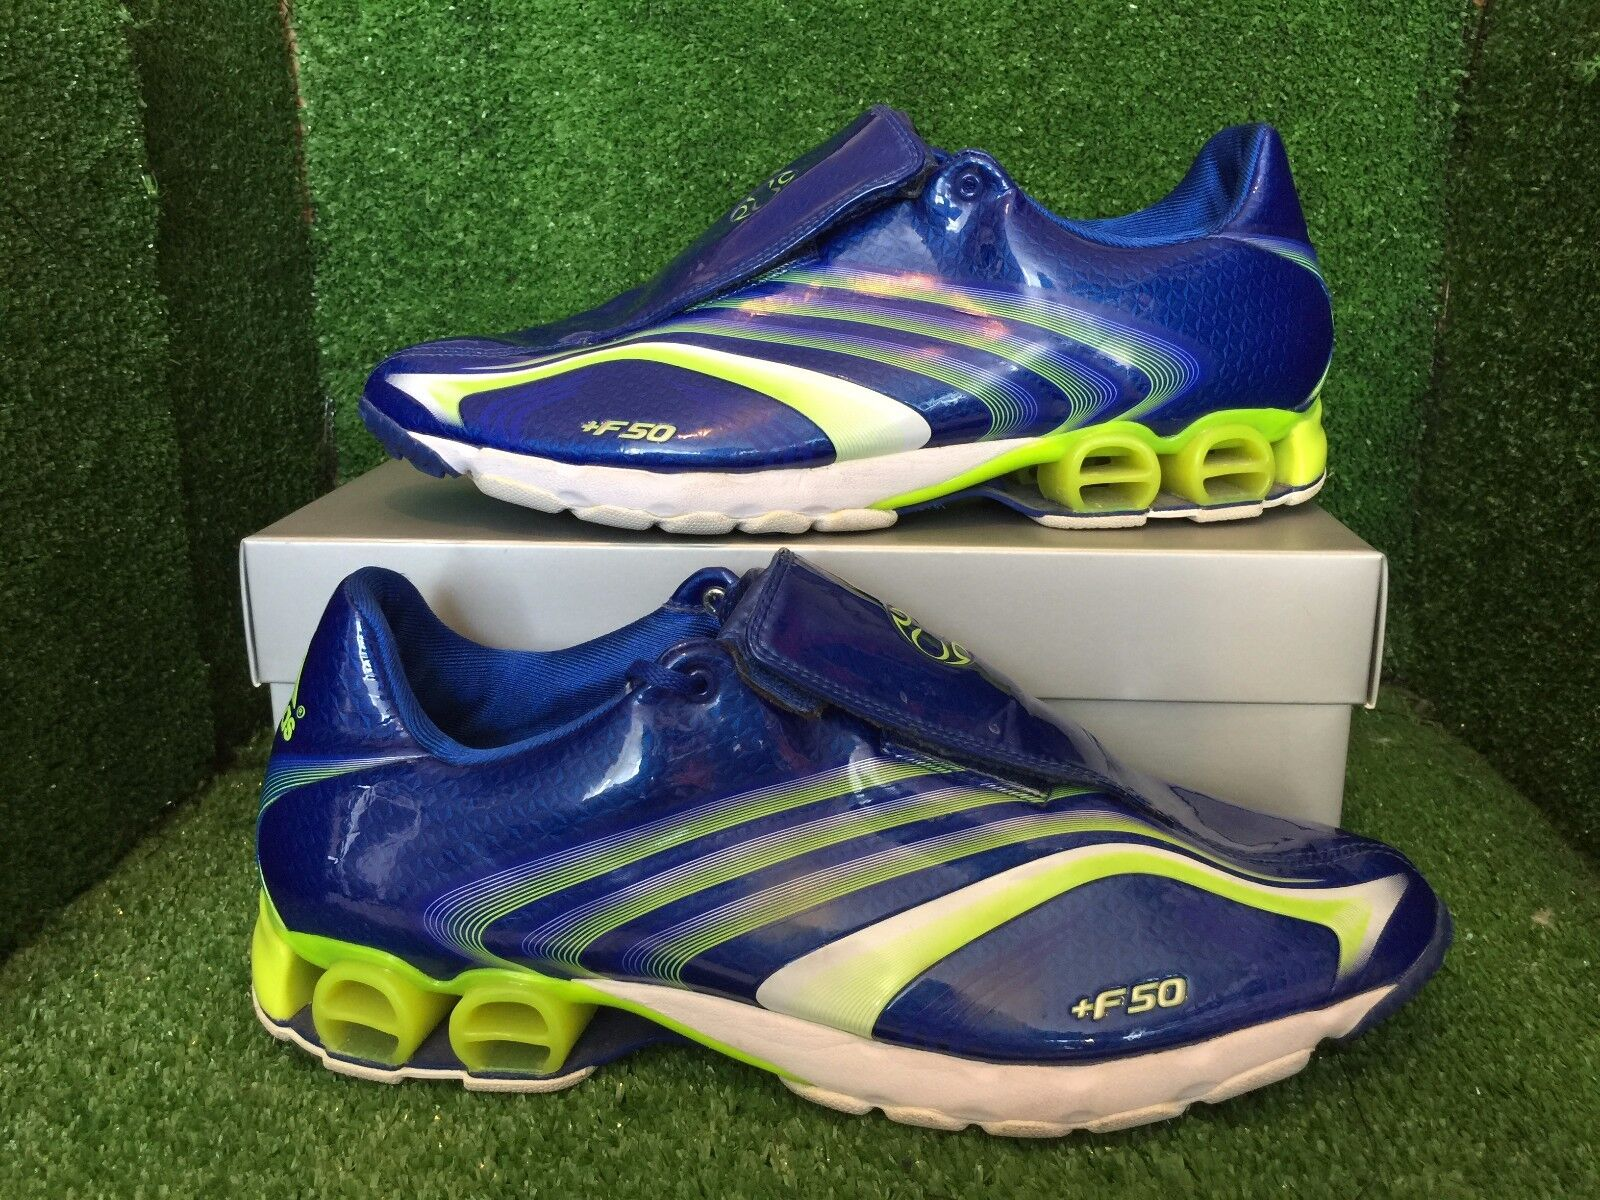 Adidas F50+ Indoor Boots Splash bluee Electric Size 11 10,5 45